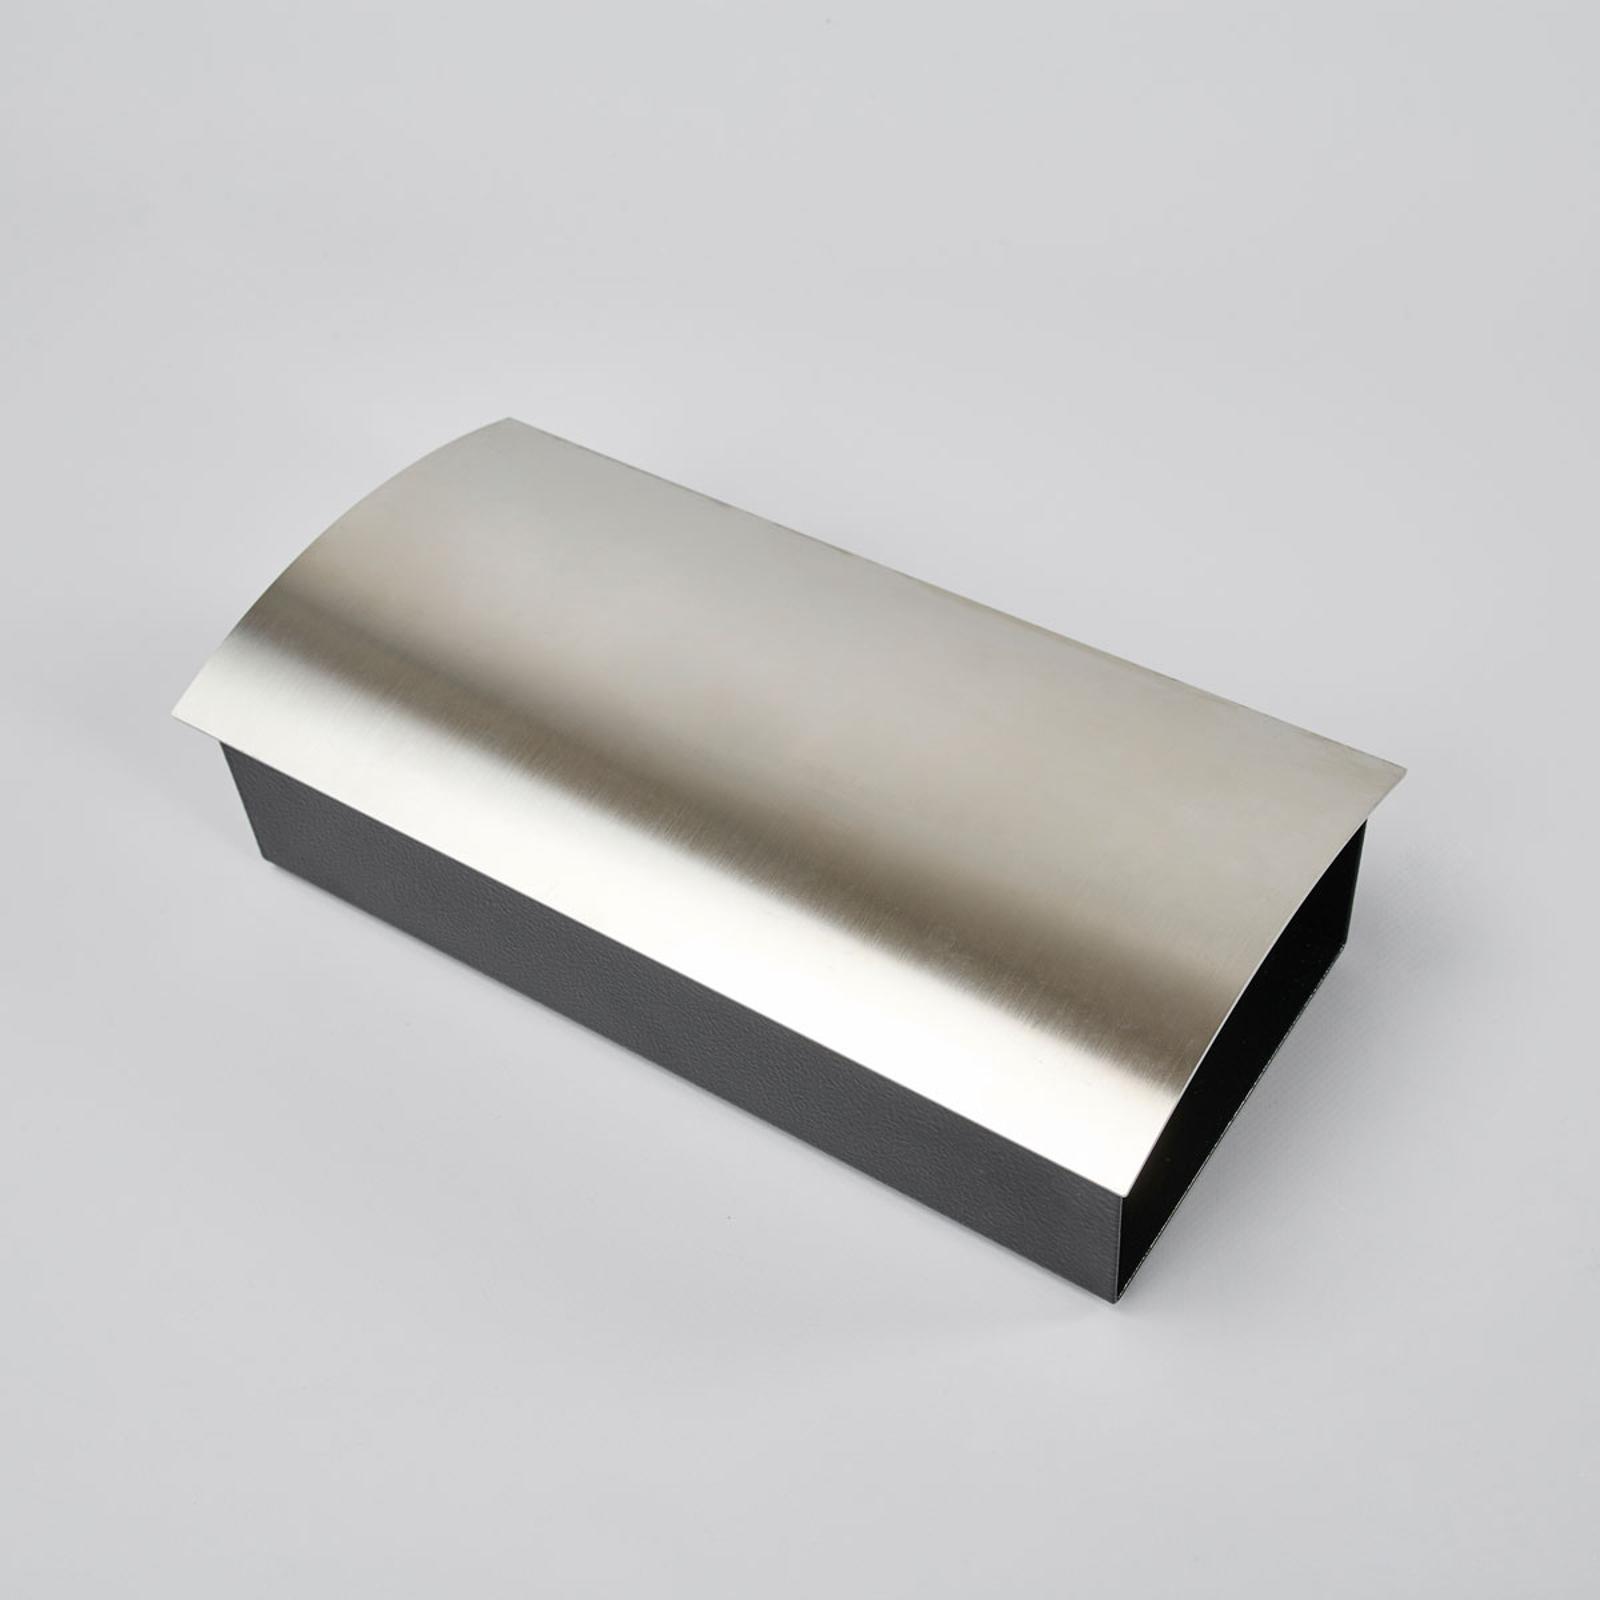 Eksklusivt Alani avisrør m ramme i rustfritt stål